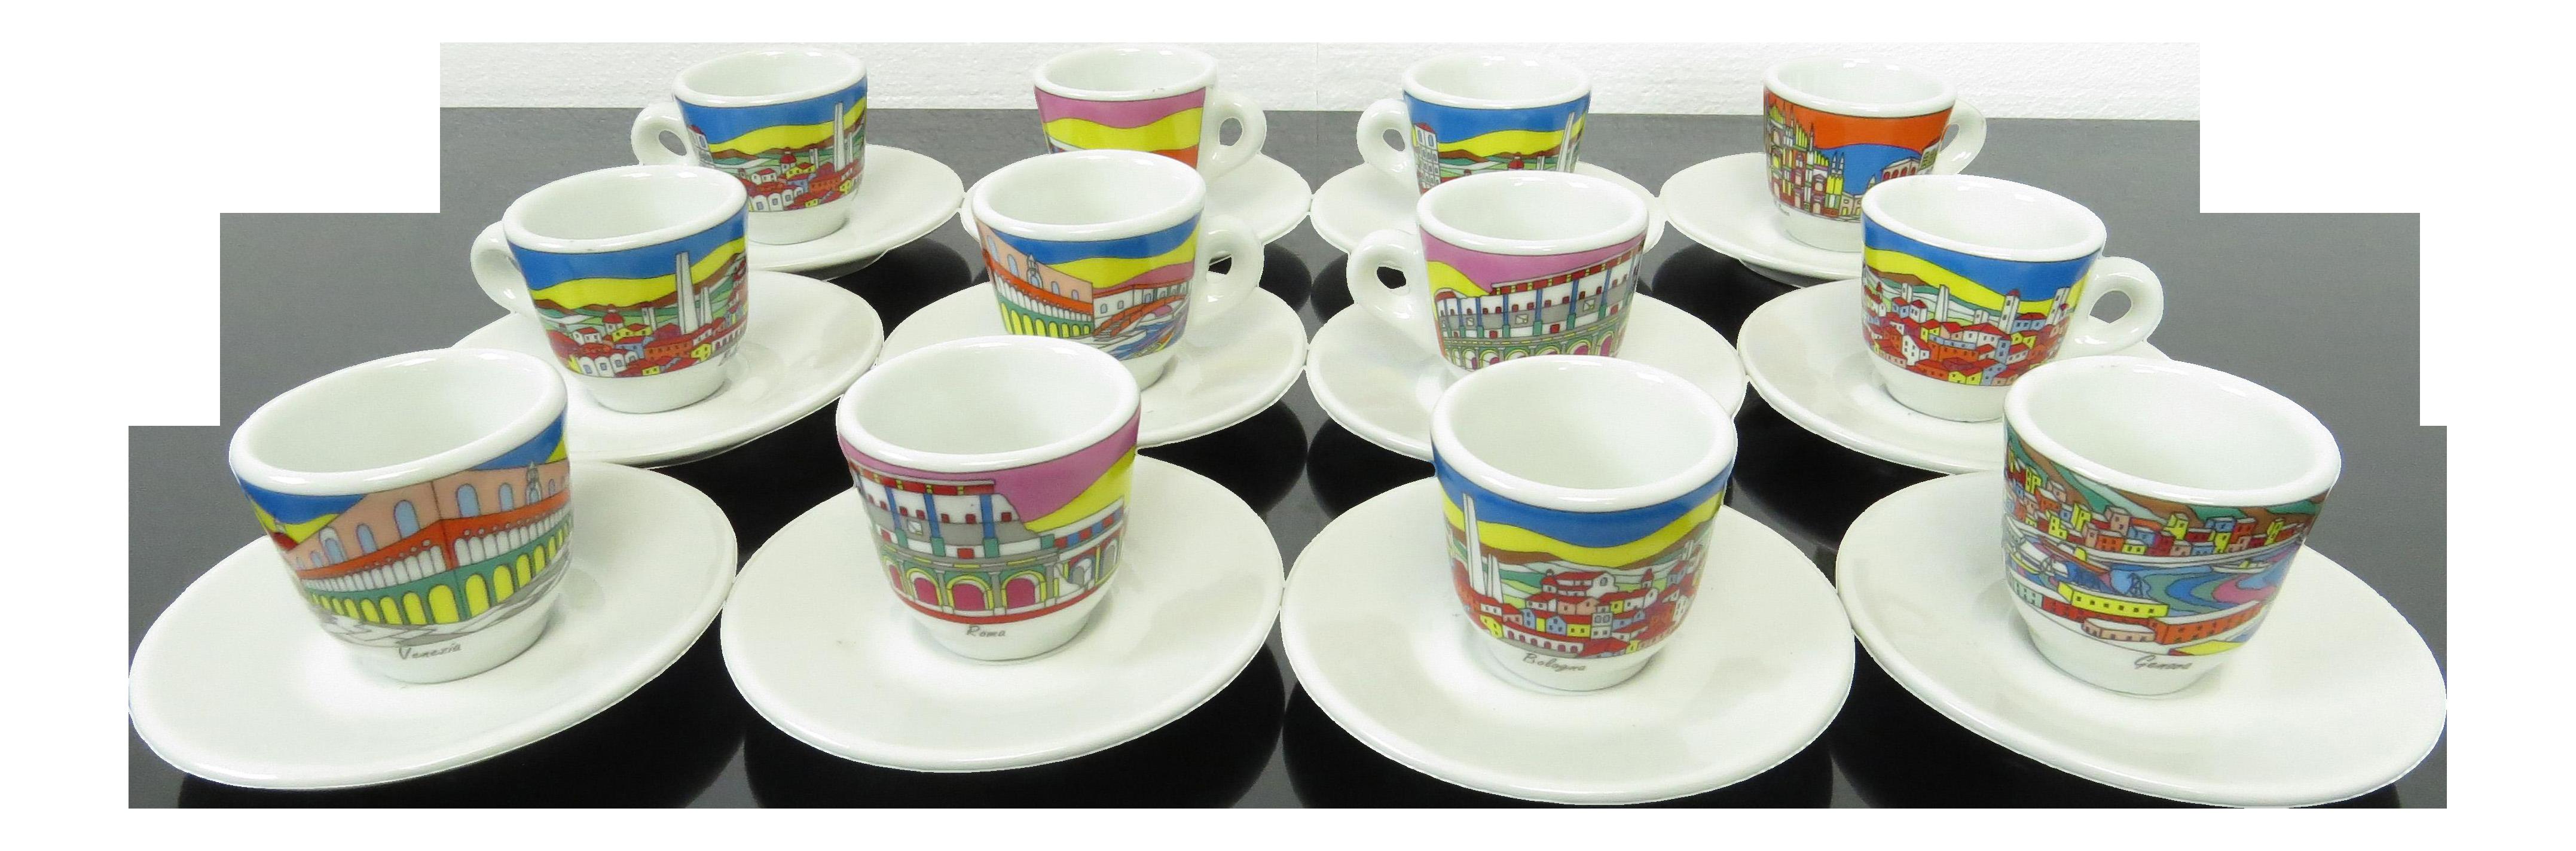 fd9262674 Vintage Nuova Point Italy City Scenes Espresso Demitasse Cups   Saucers -  Set of 12